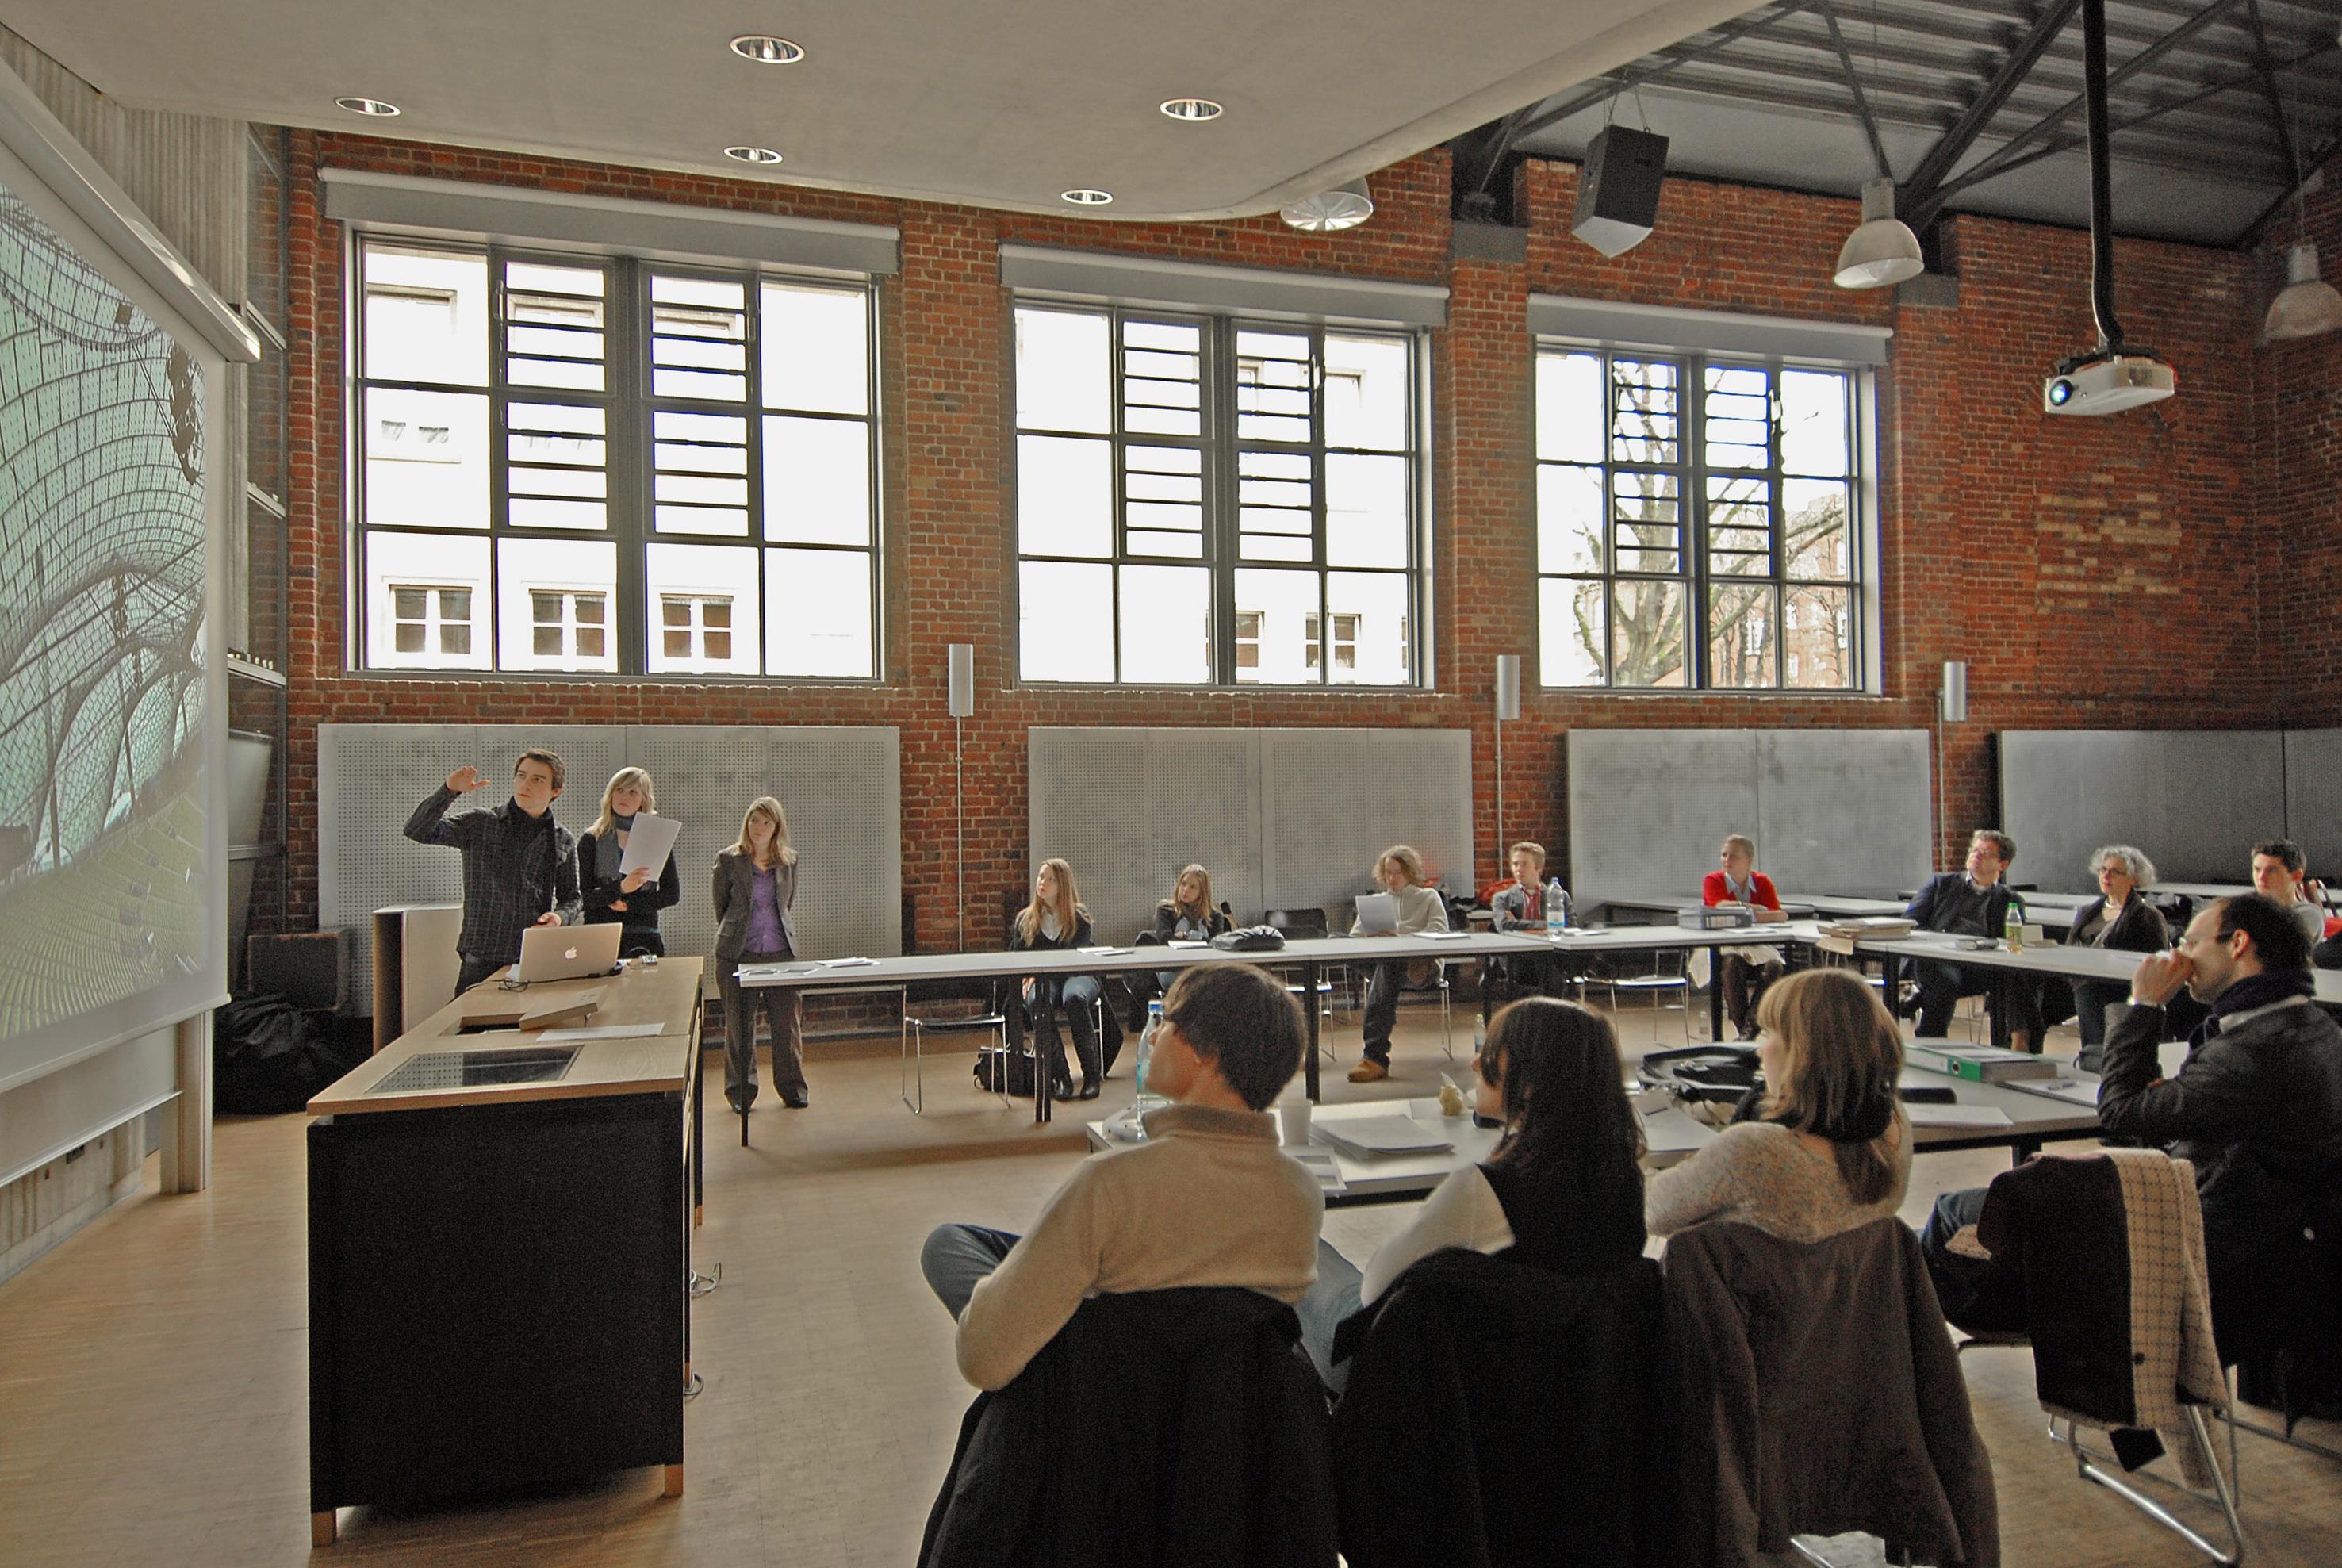 Münster Architekten faculty of civil engineering